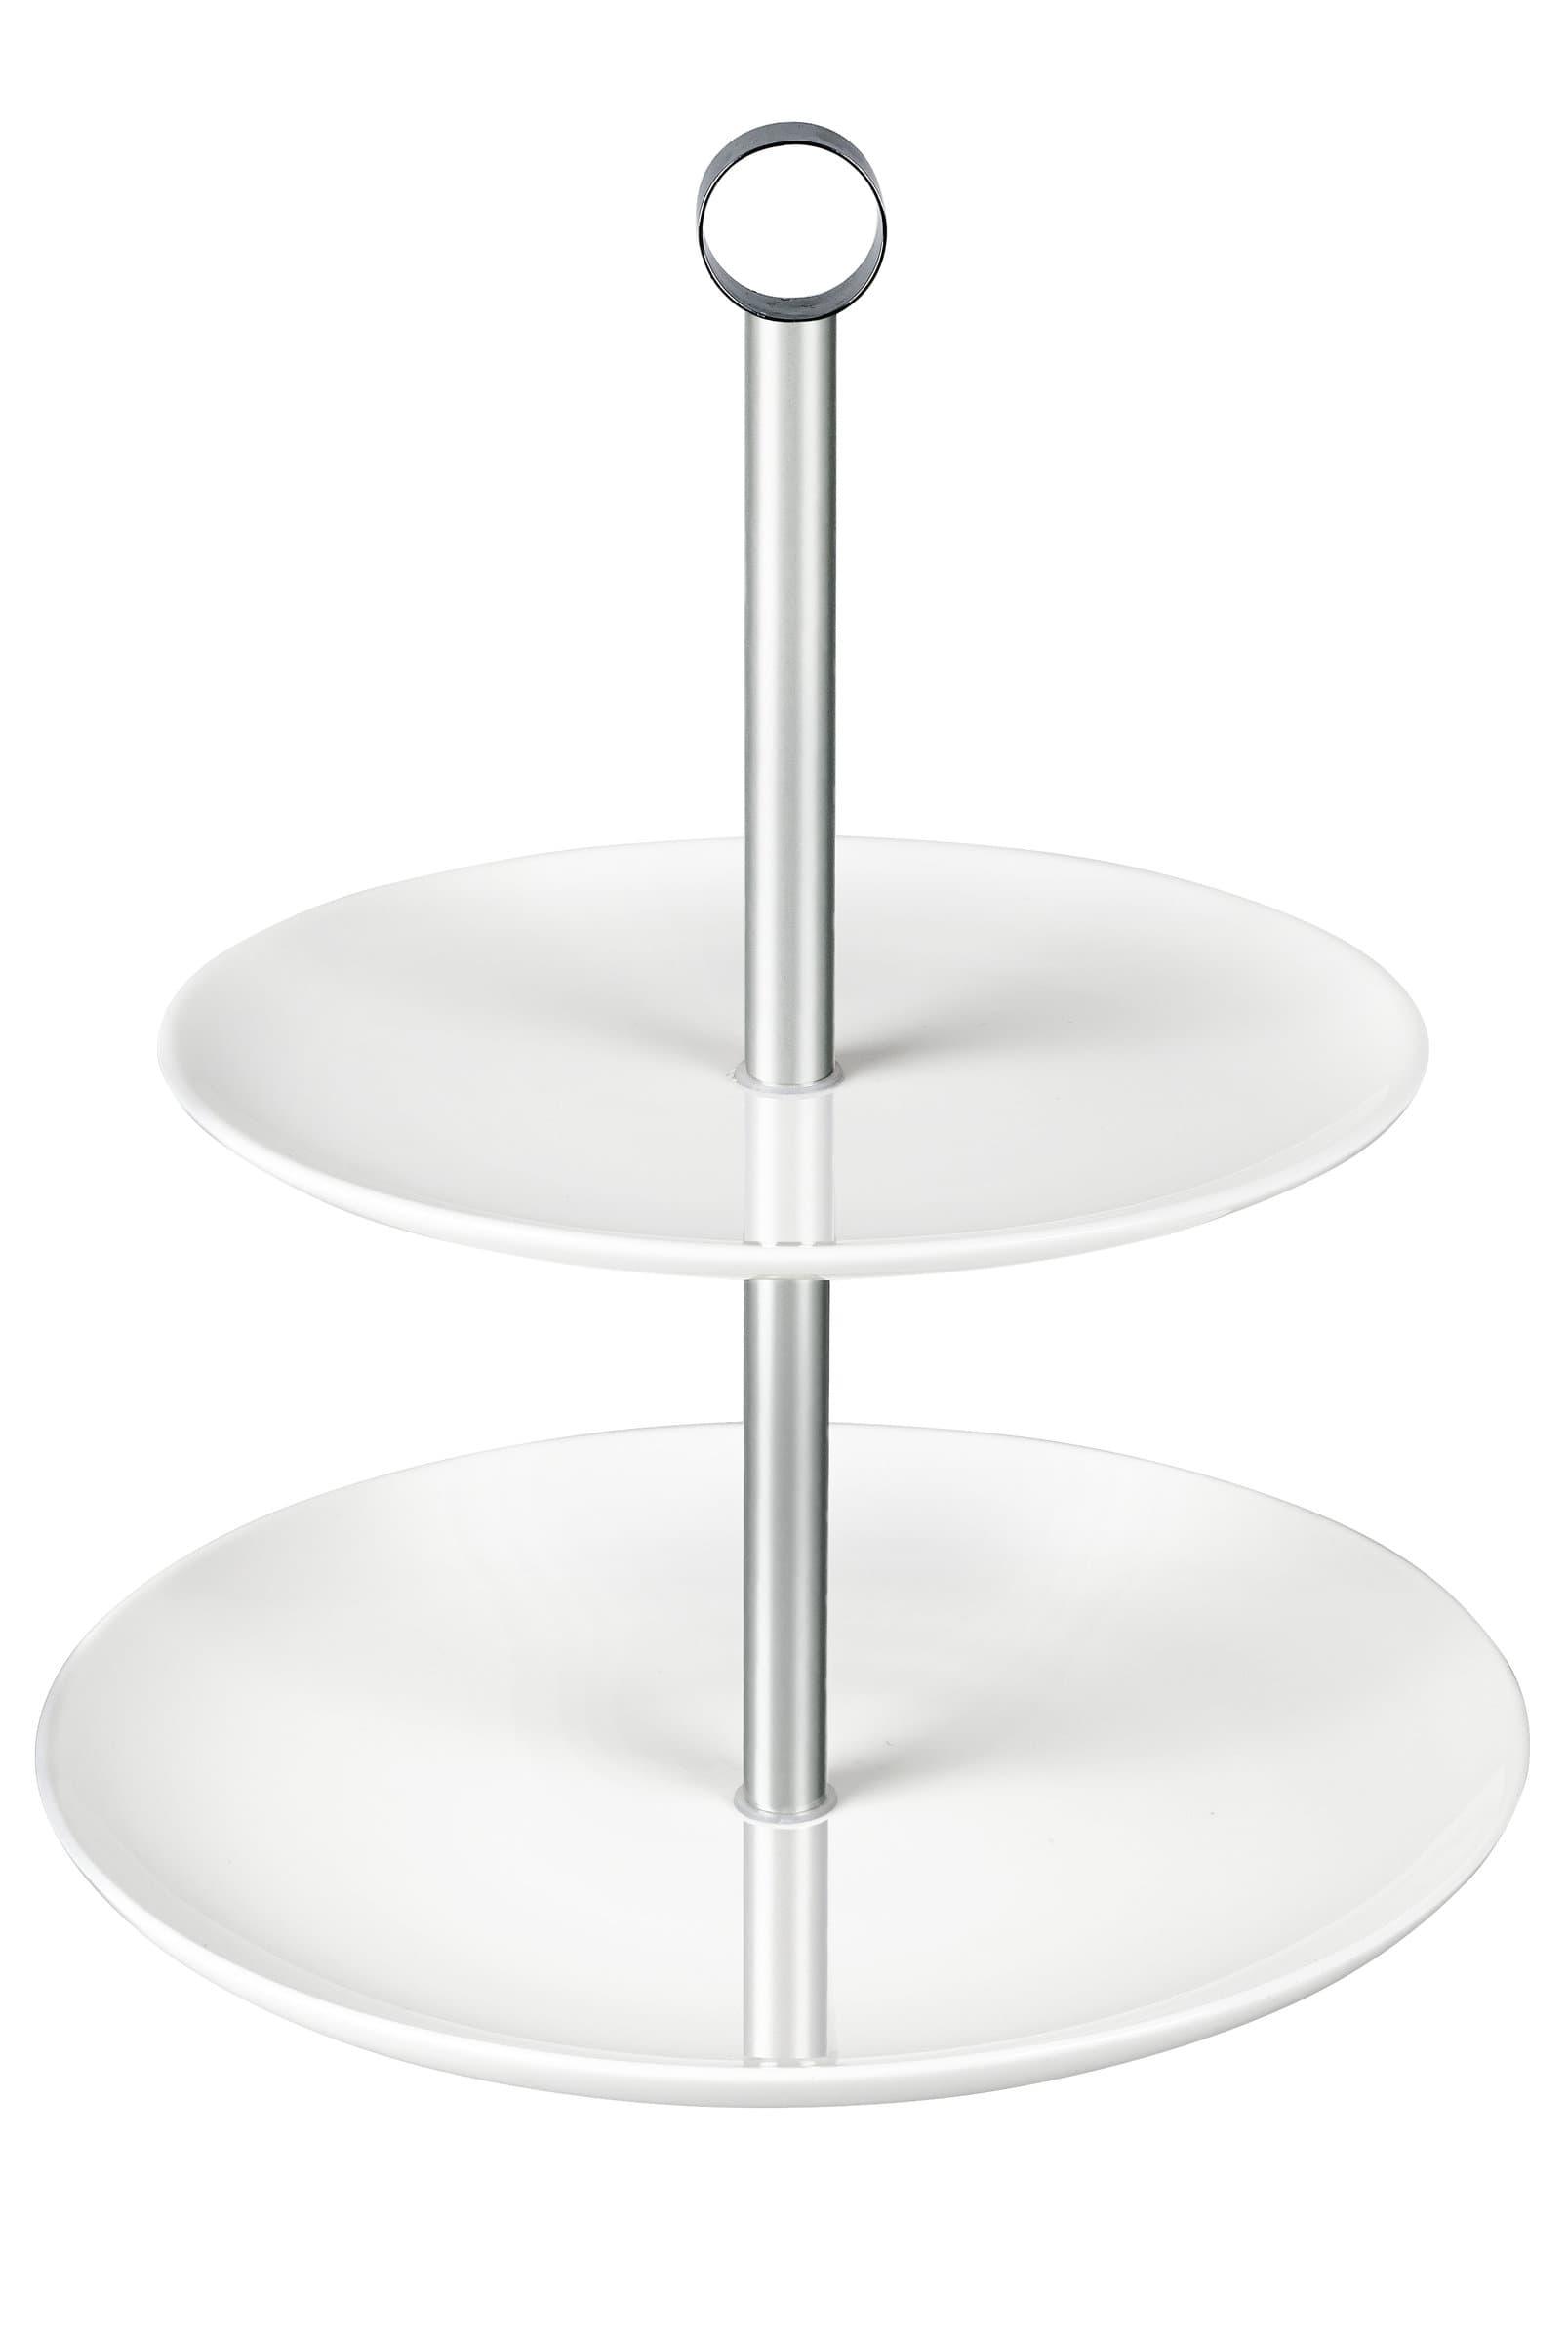 Cucina & Tavola Etagere Porzellan